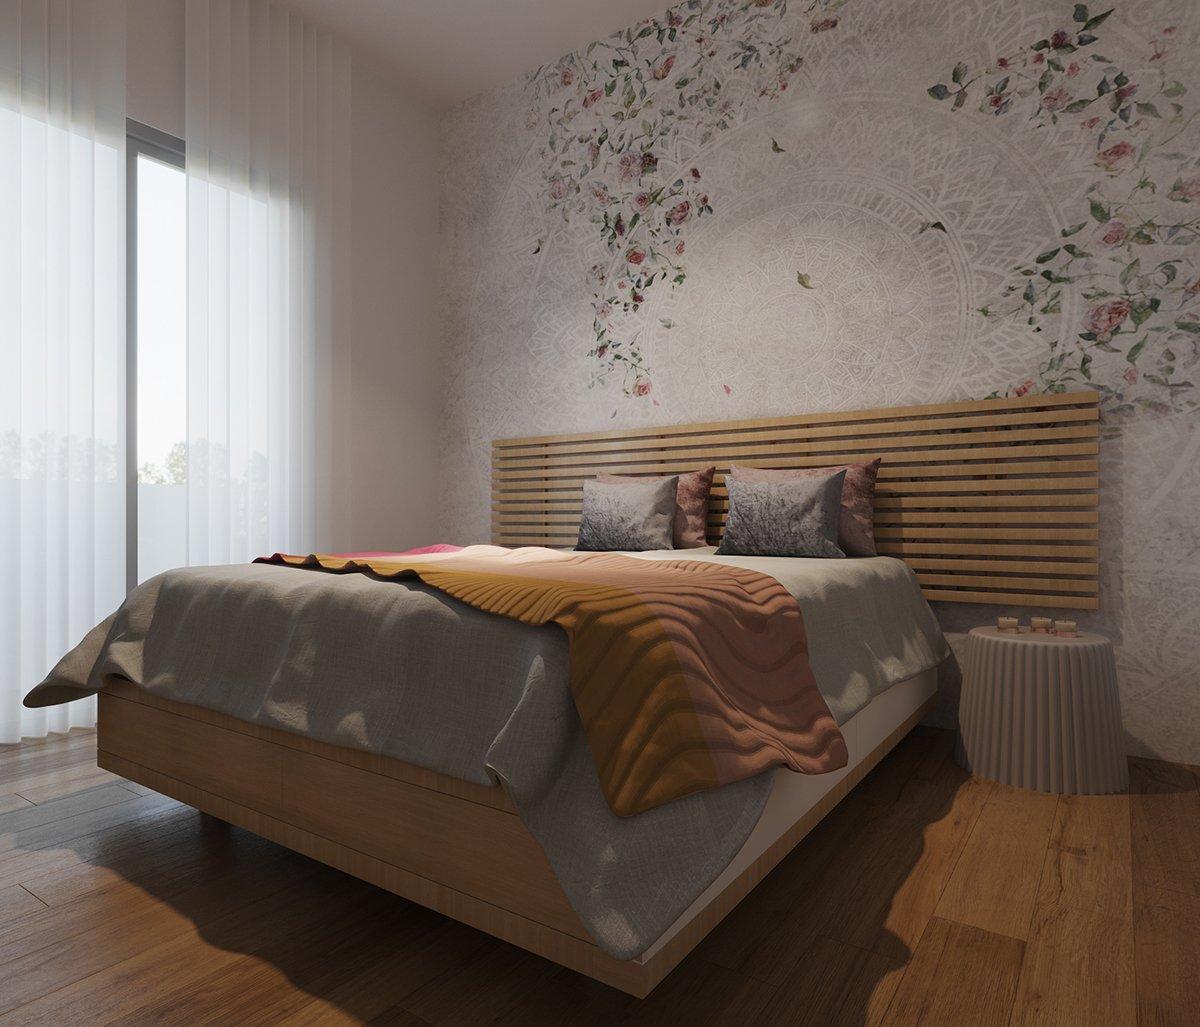 aglantzia 2 bed apt for sale